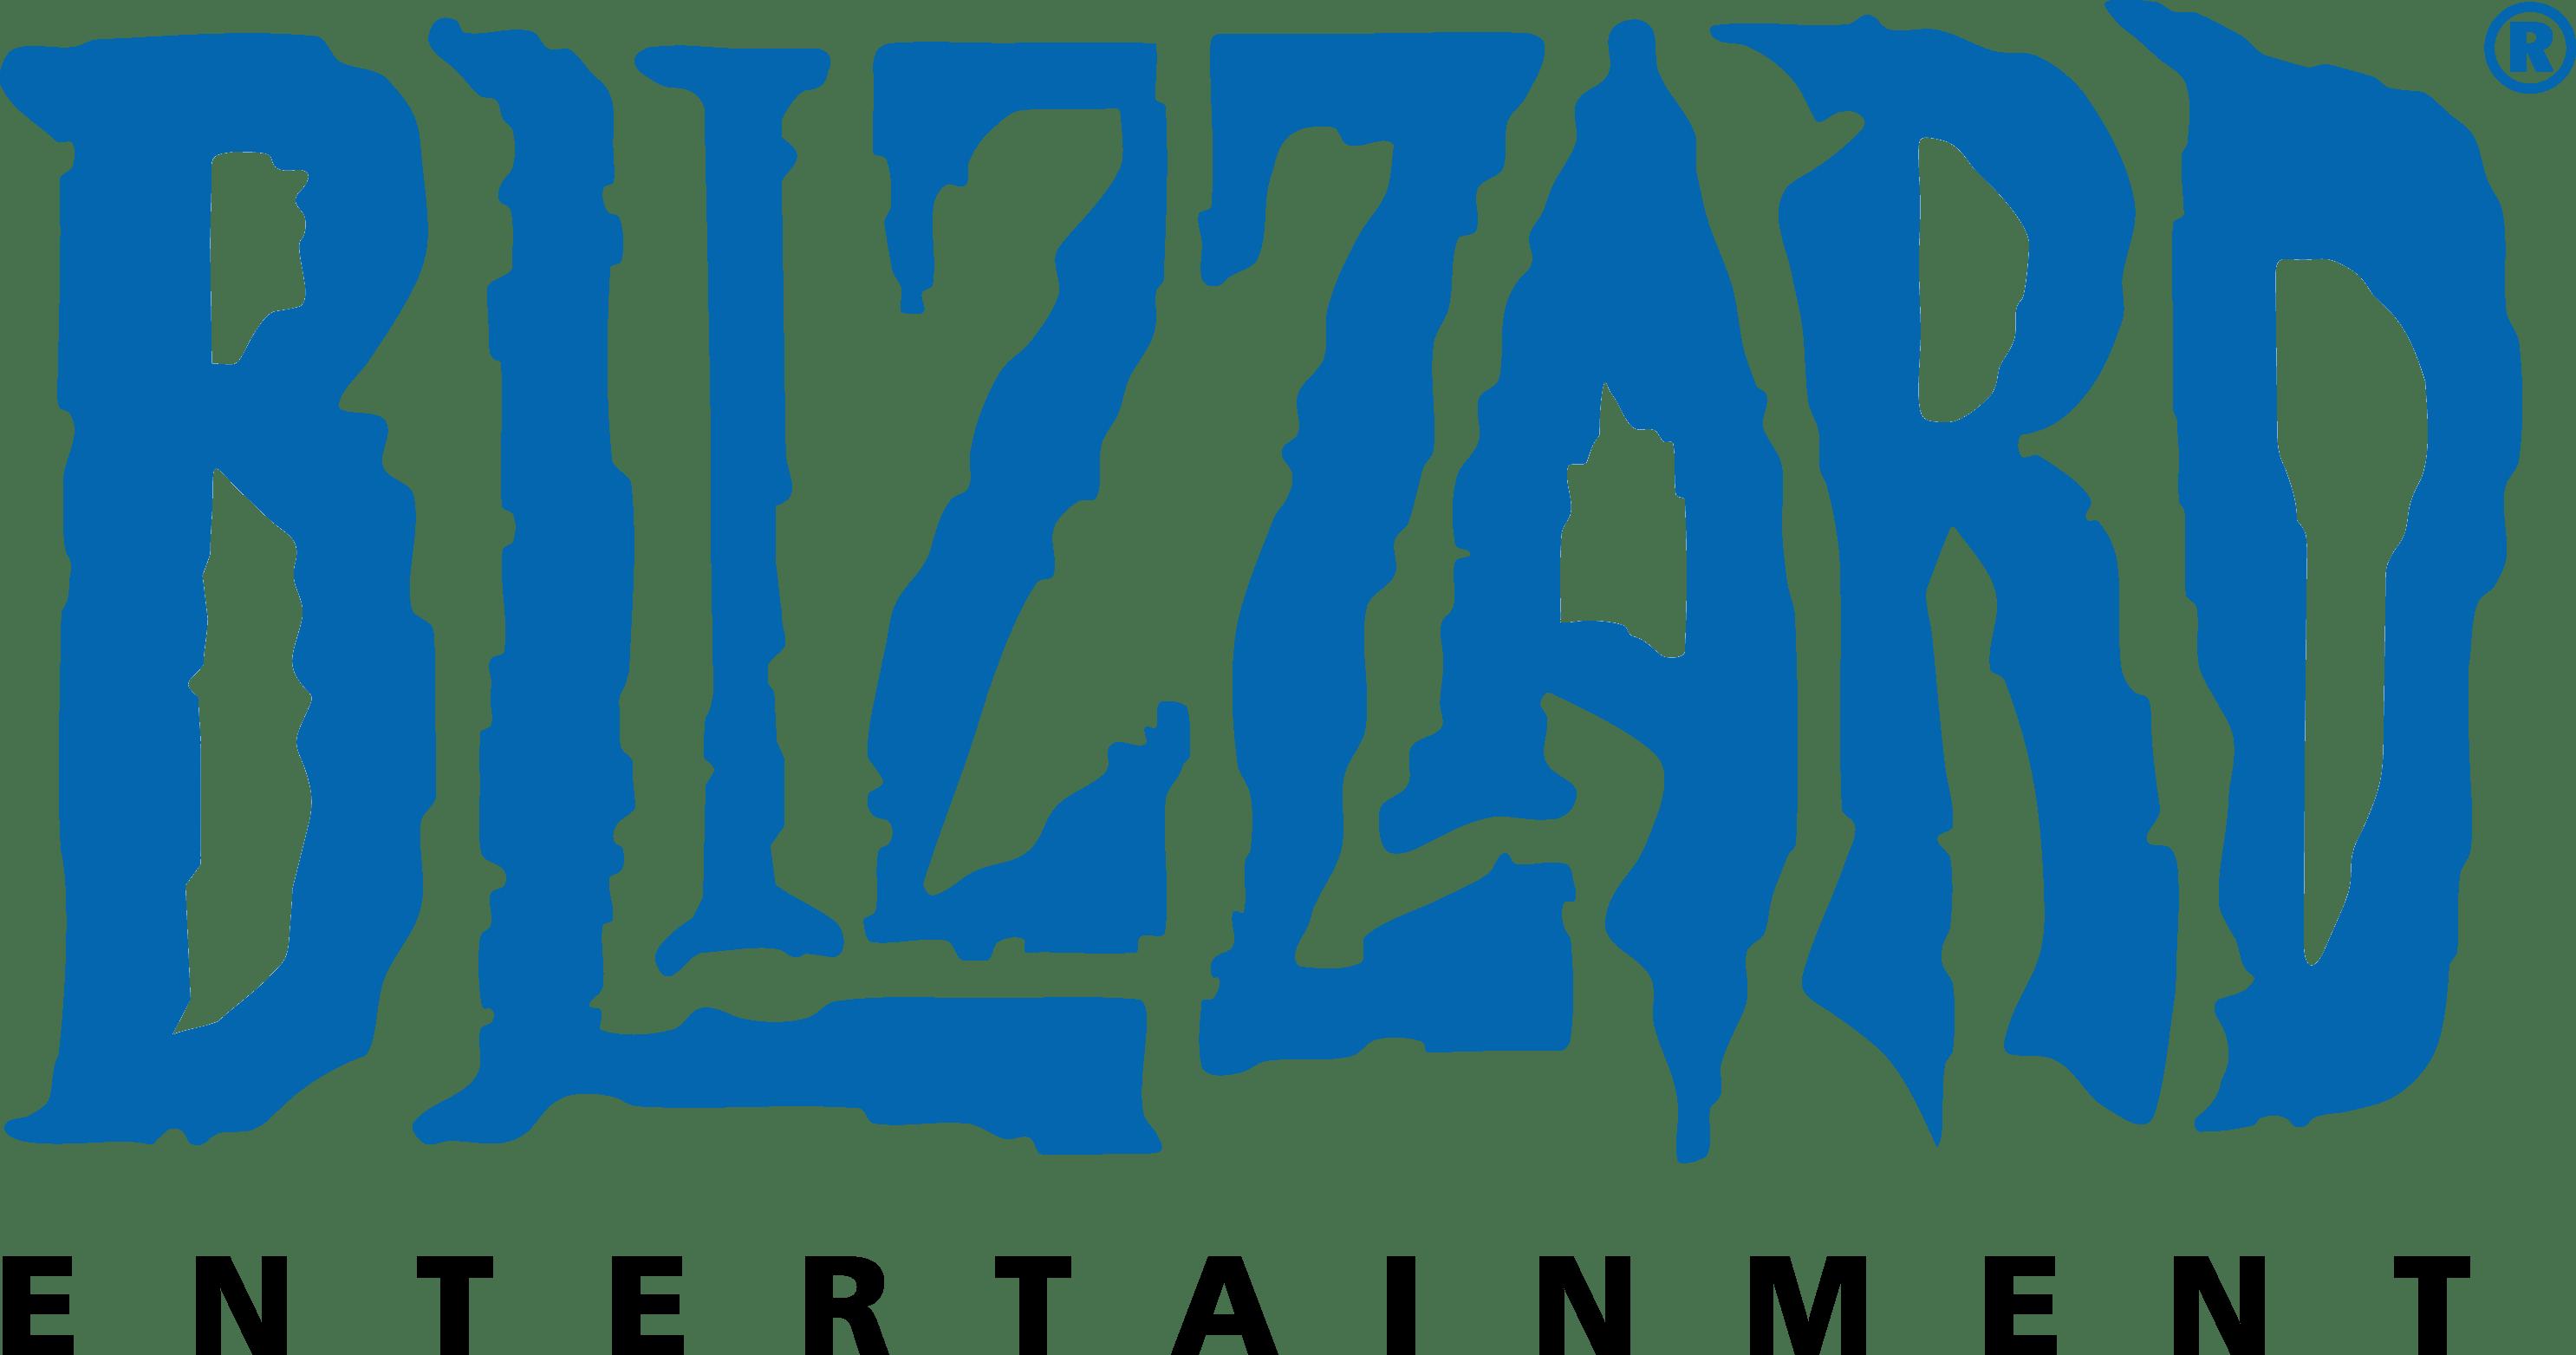 Blizzard Logo png